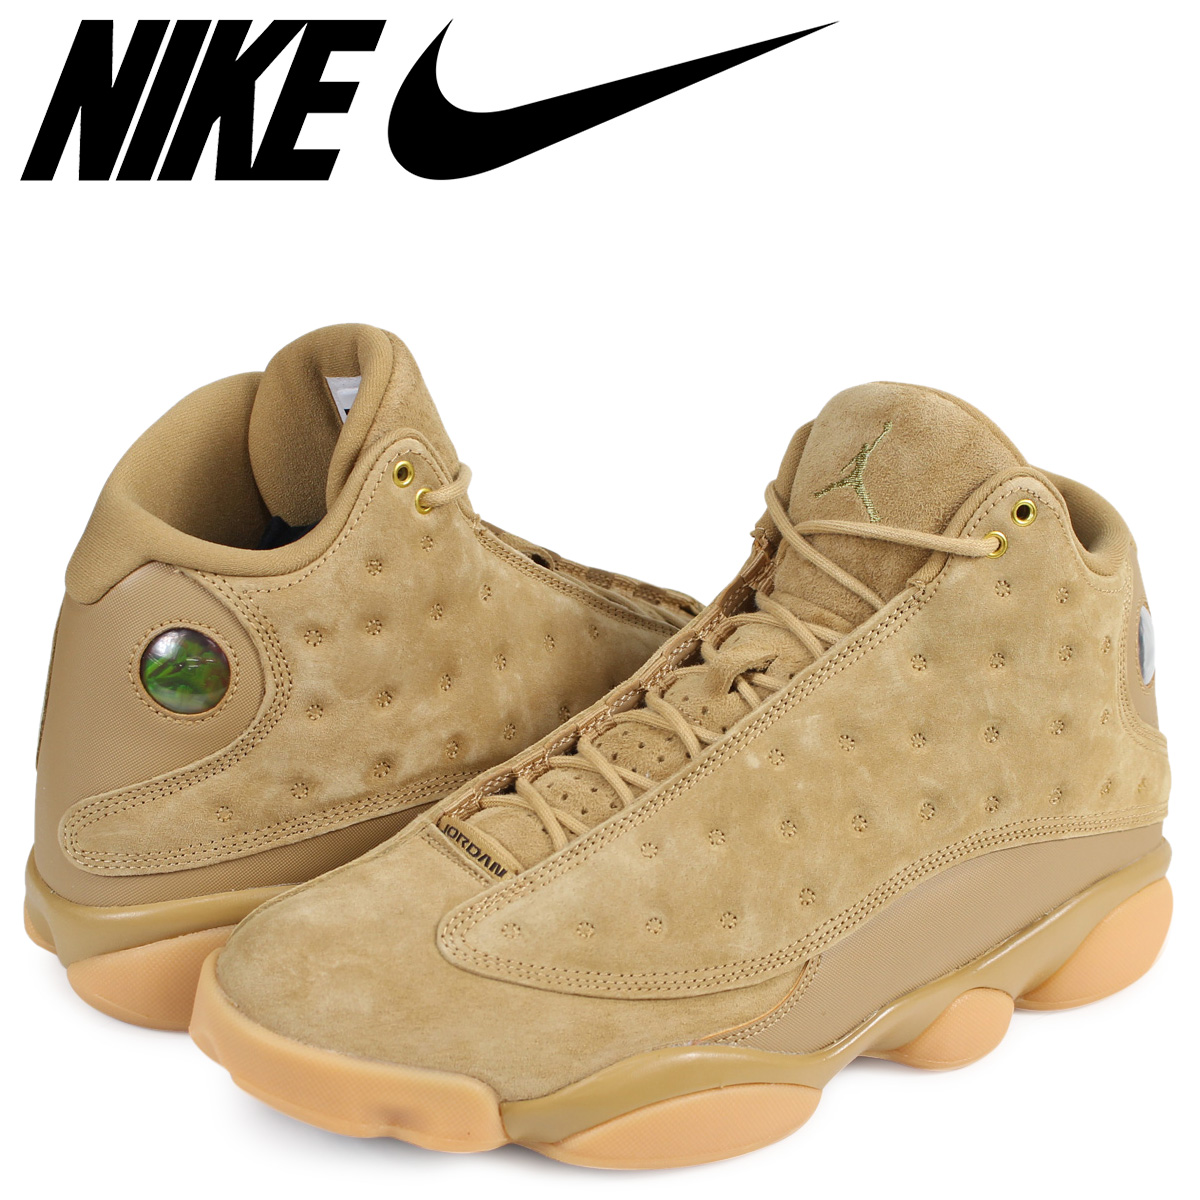 quality design 6a609 e922a NIKE AIR JORDAN 13 RETRO Nike Air Jordan 13 nostalgic sneakers 414,571-705  men's beige